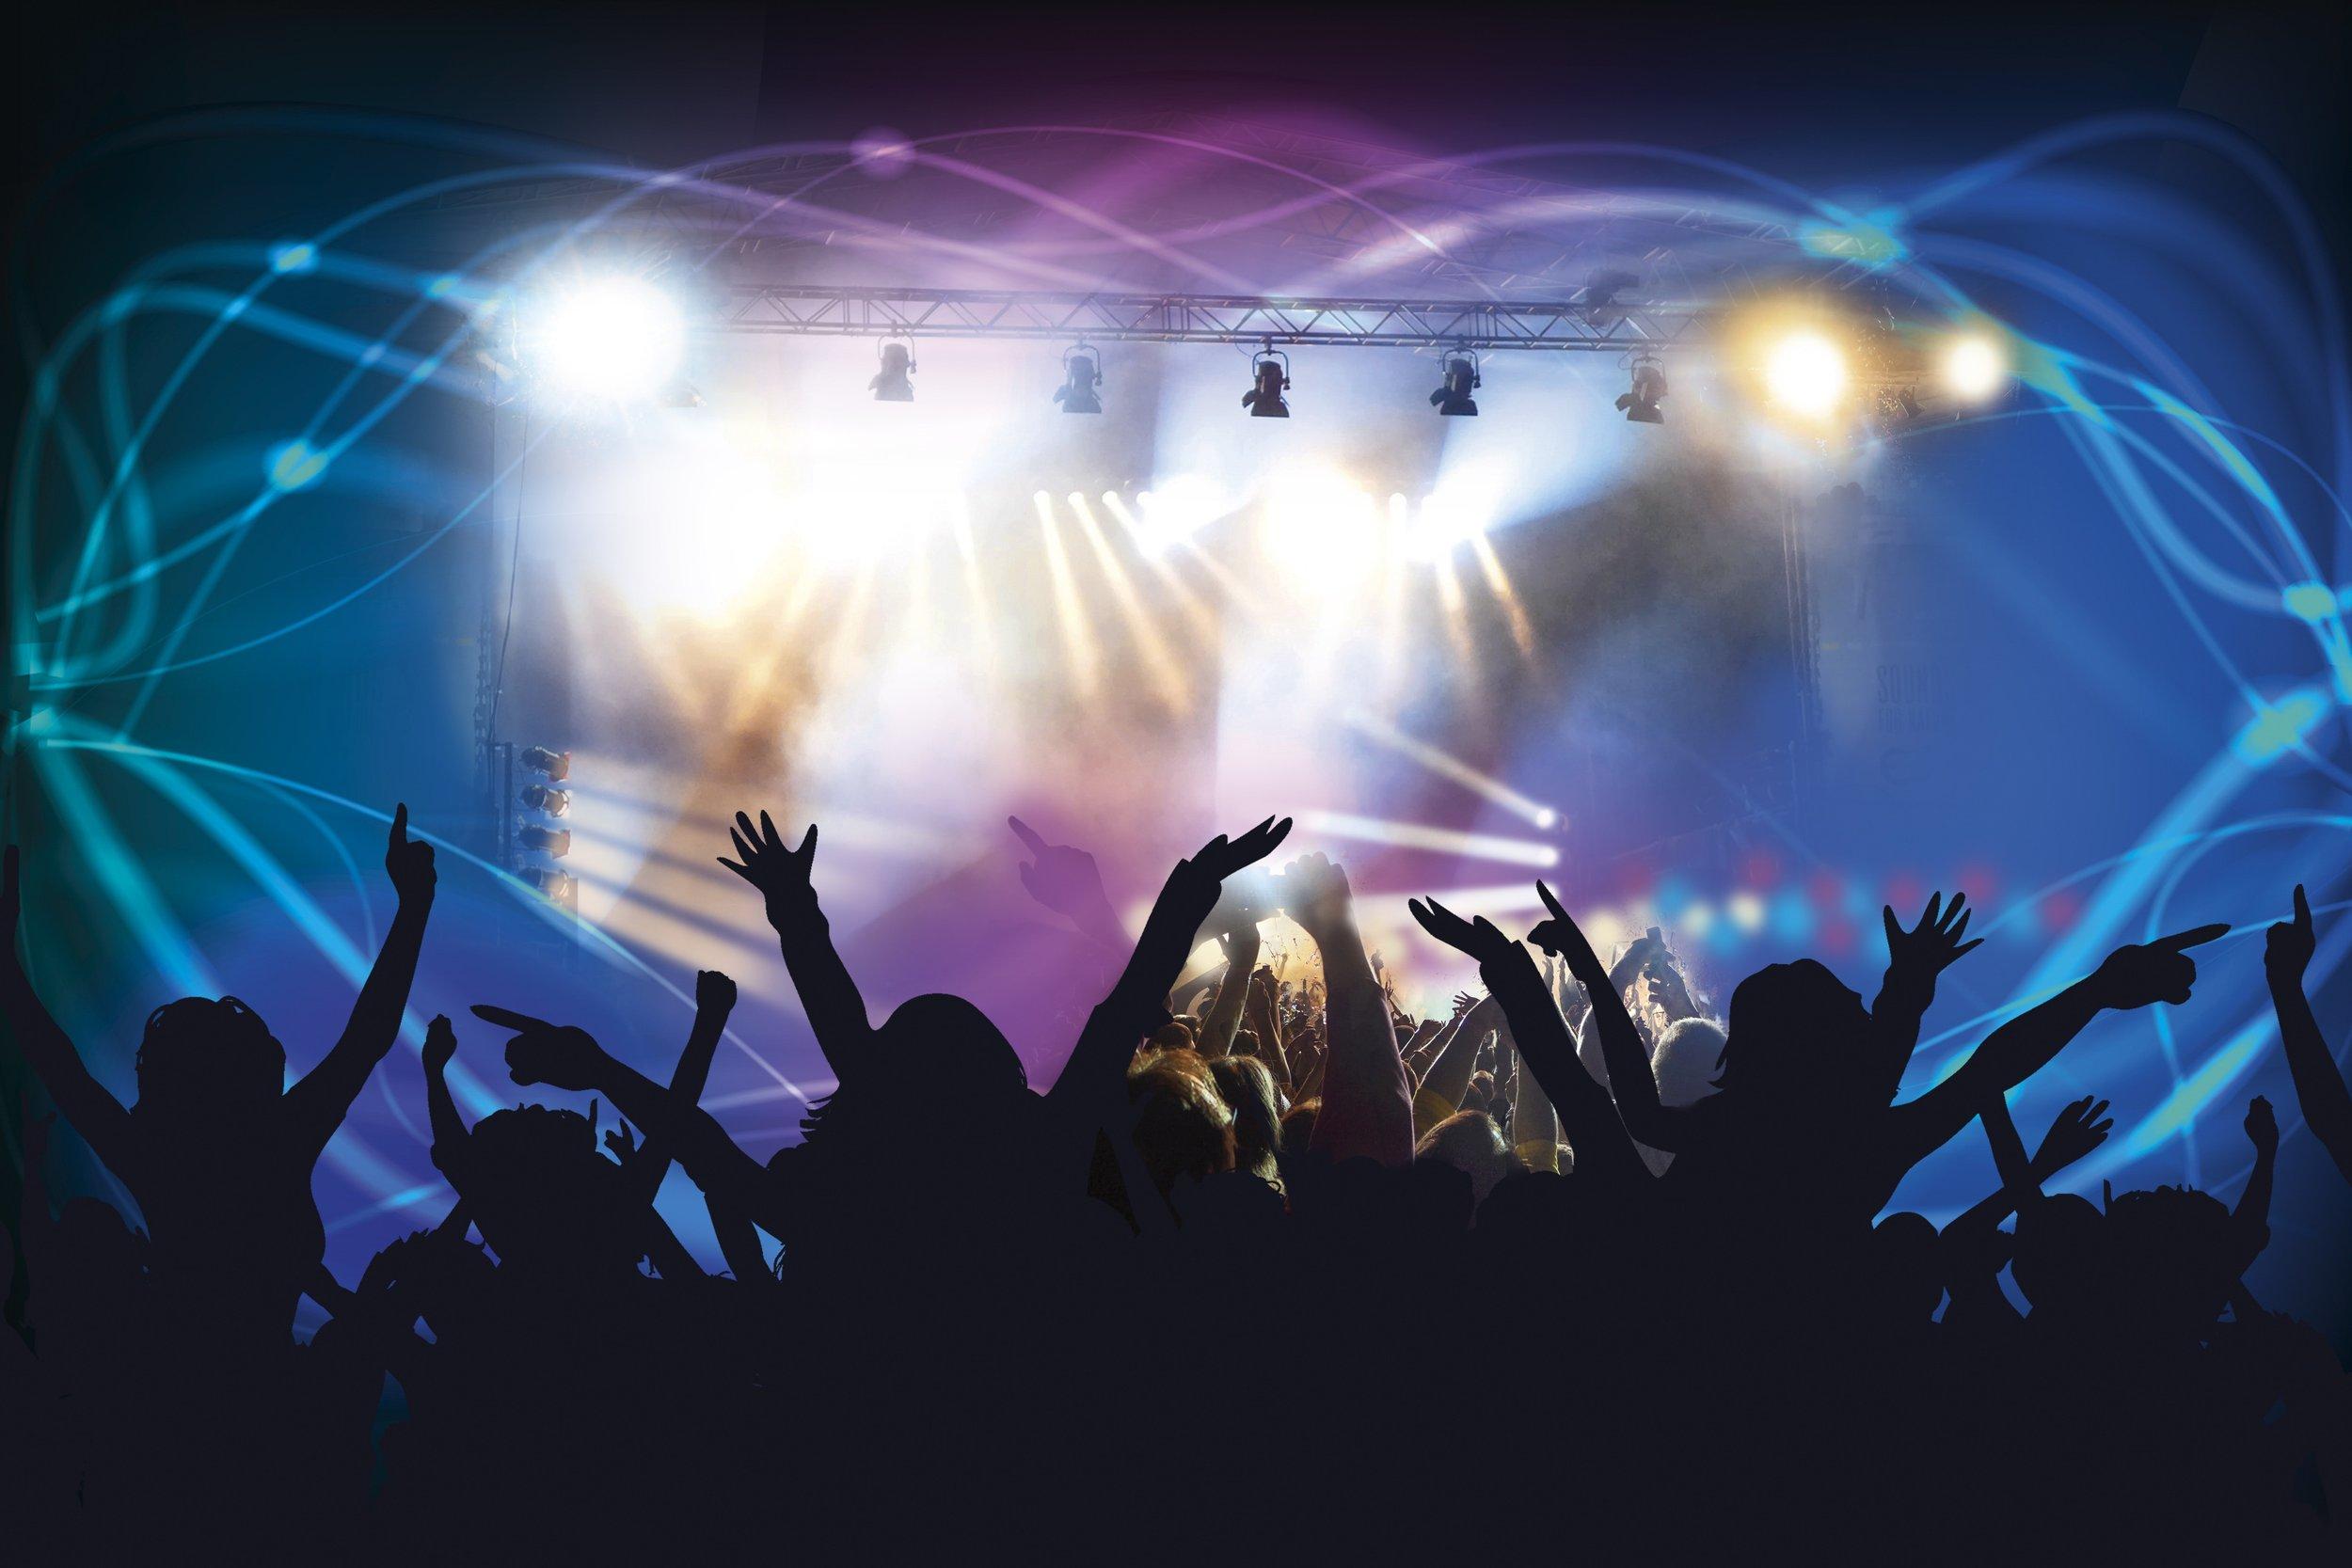 cheerful-concert-crowd-2143.jpg